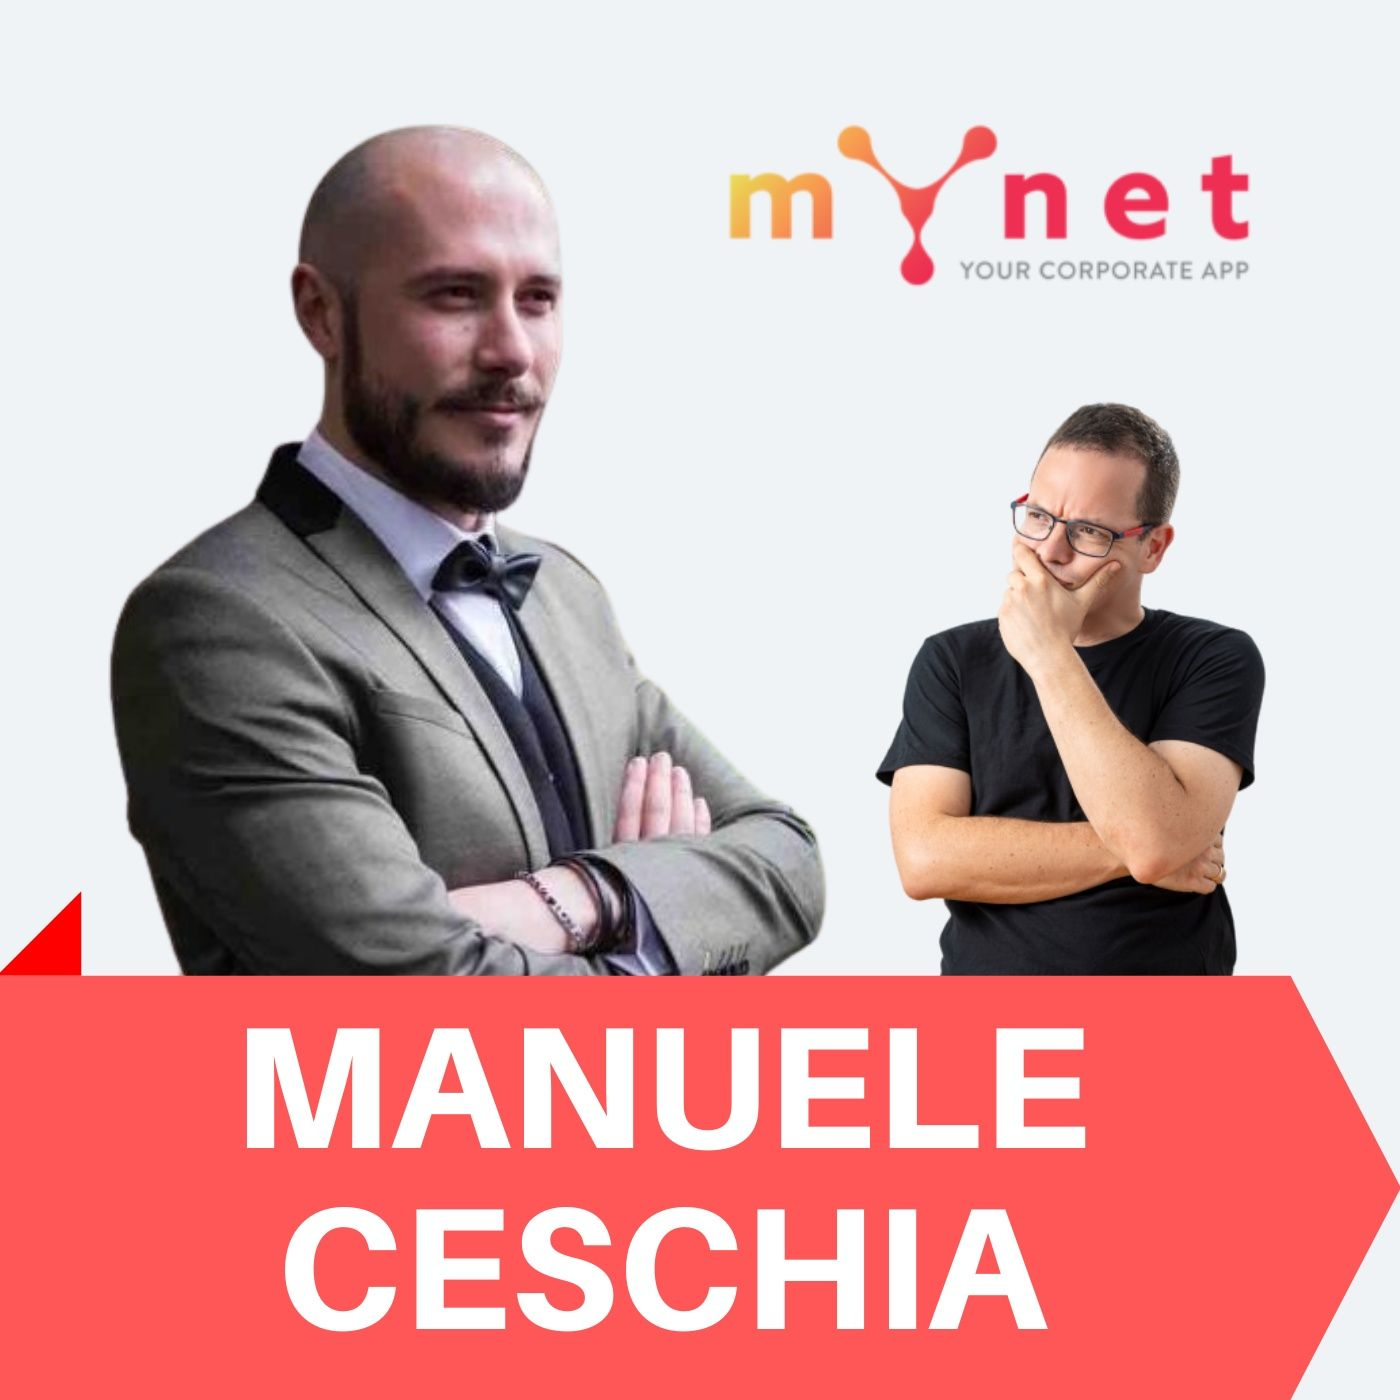 189 - Manuele Ceschia - tutti i progetti portano a MyNet